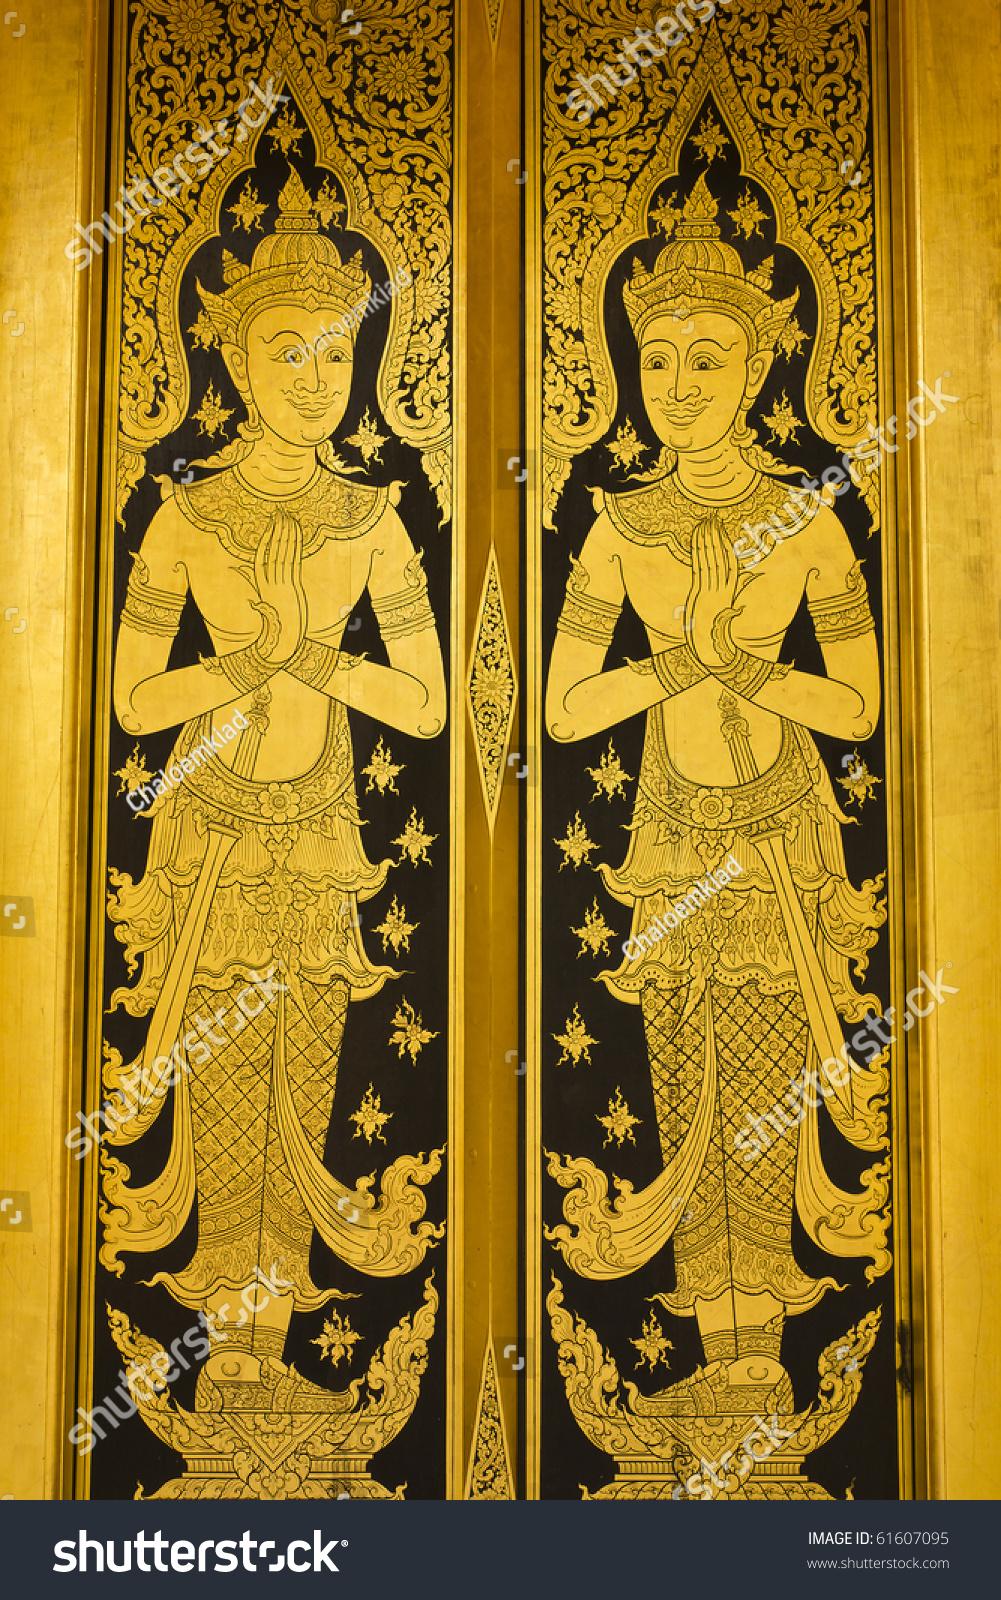 thai gold lacquer gilt temple door detail. THIS IMAGE IS PUBLIC DOMAIN FROM A THAI & Thai Gold Lacquer Gilt Temple Door Stock Photo 61607095 - Shutterstock Pezcame.Com